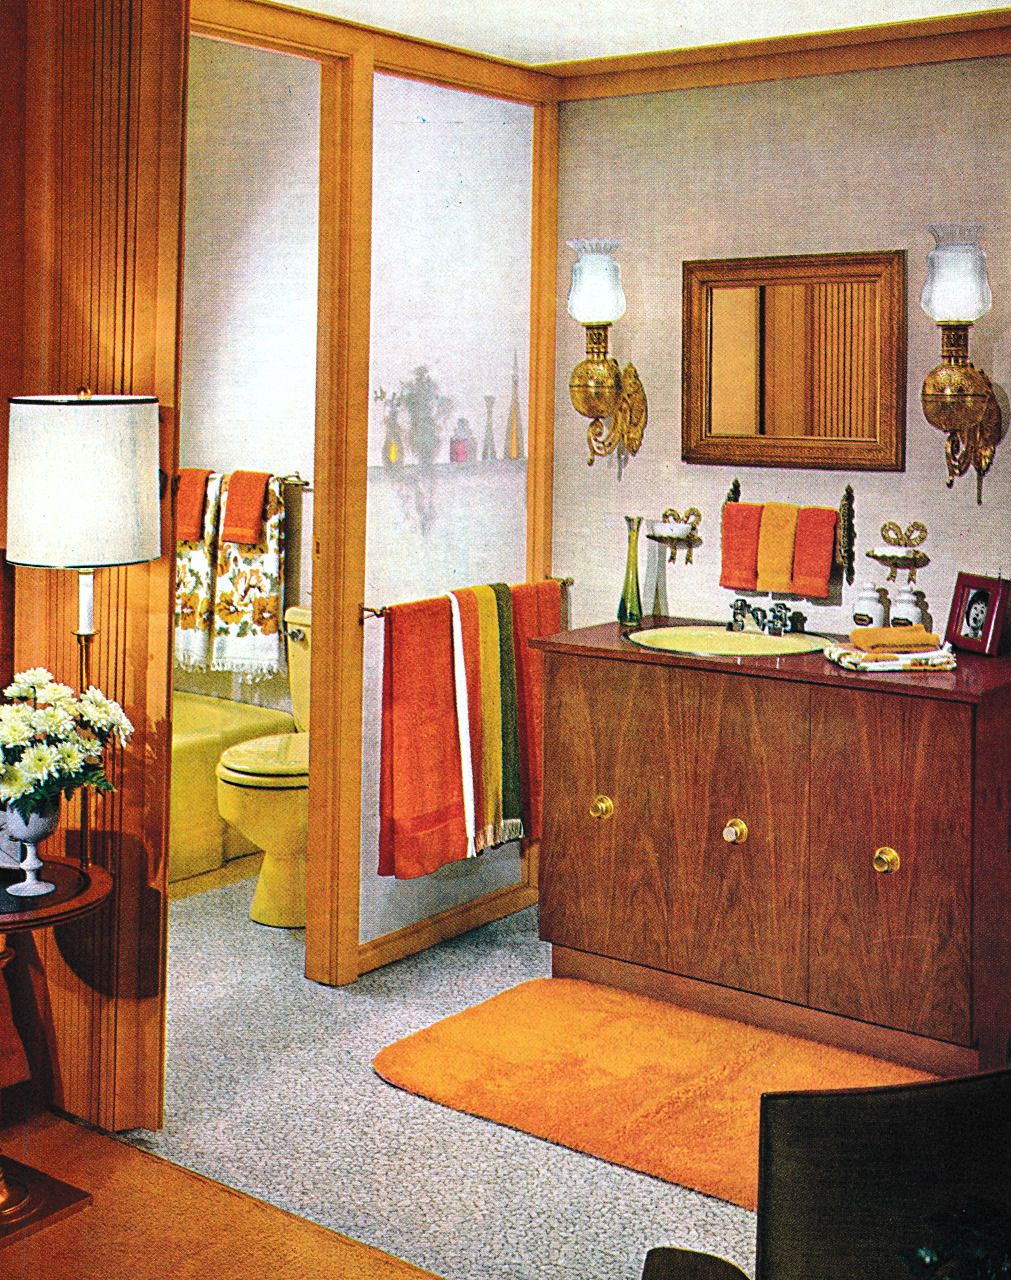 1970s Bathroom Decor In 2020 Bathroom Design Decor 70s Home